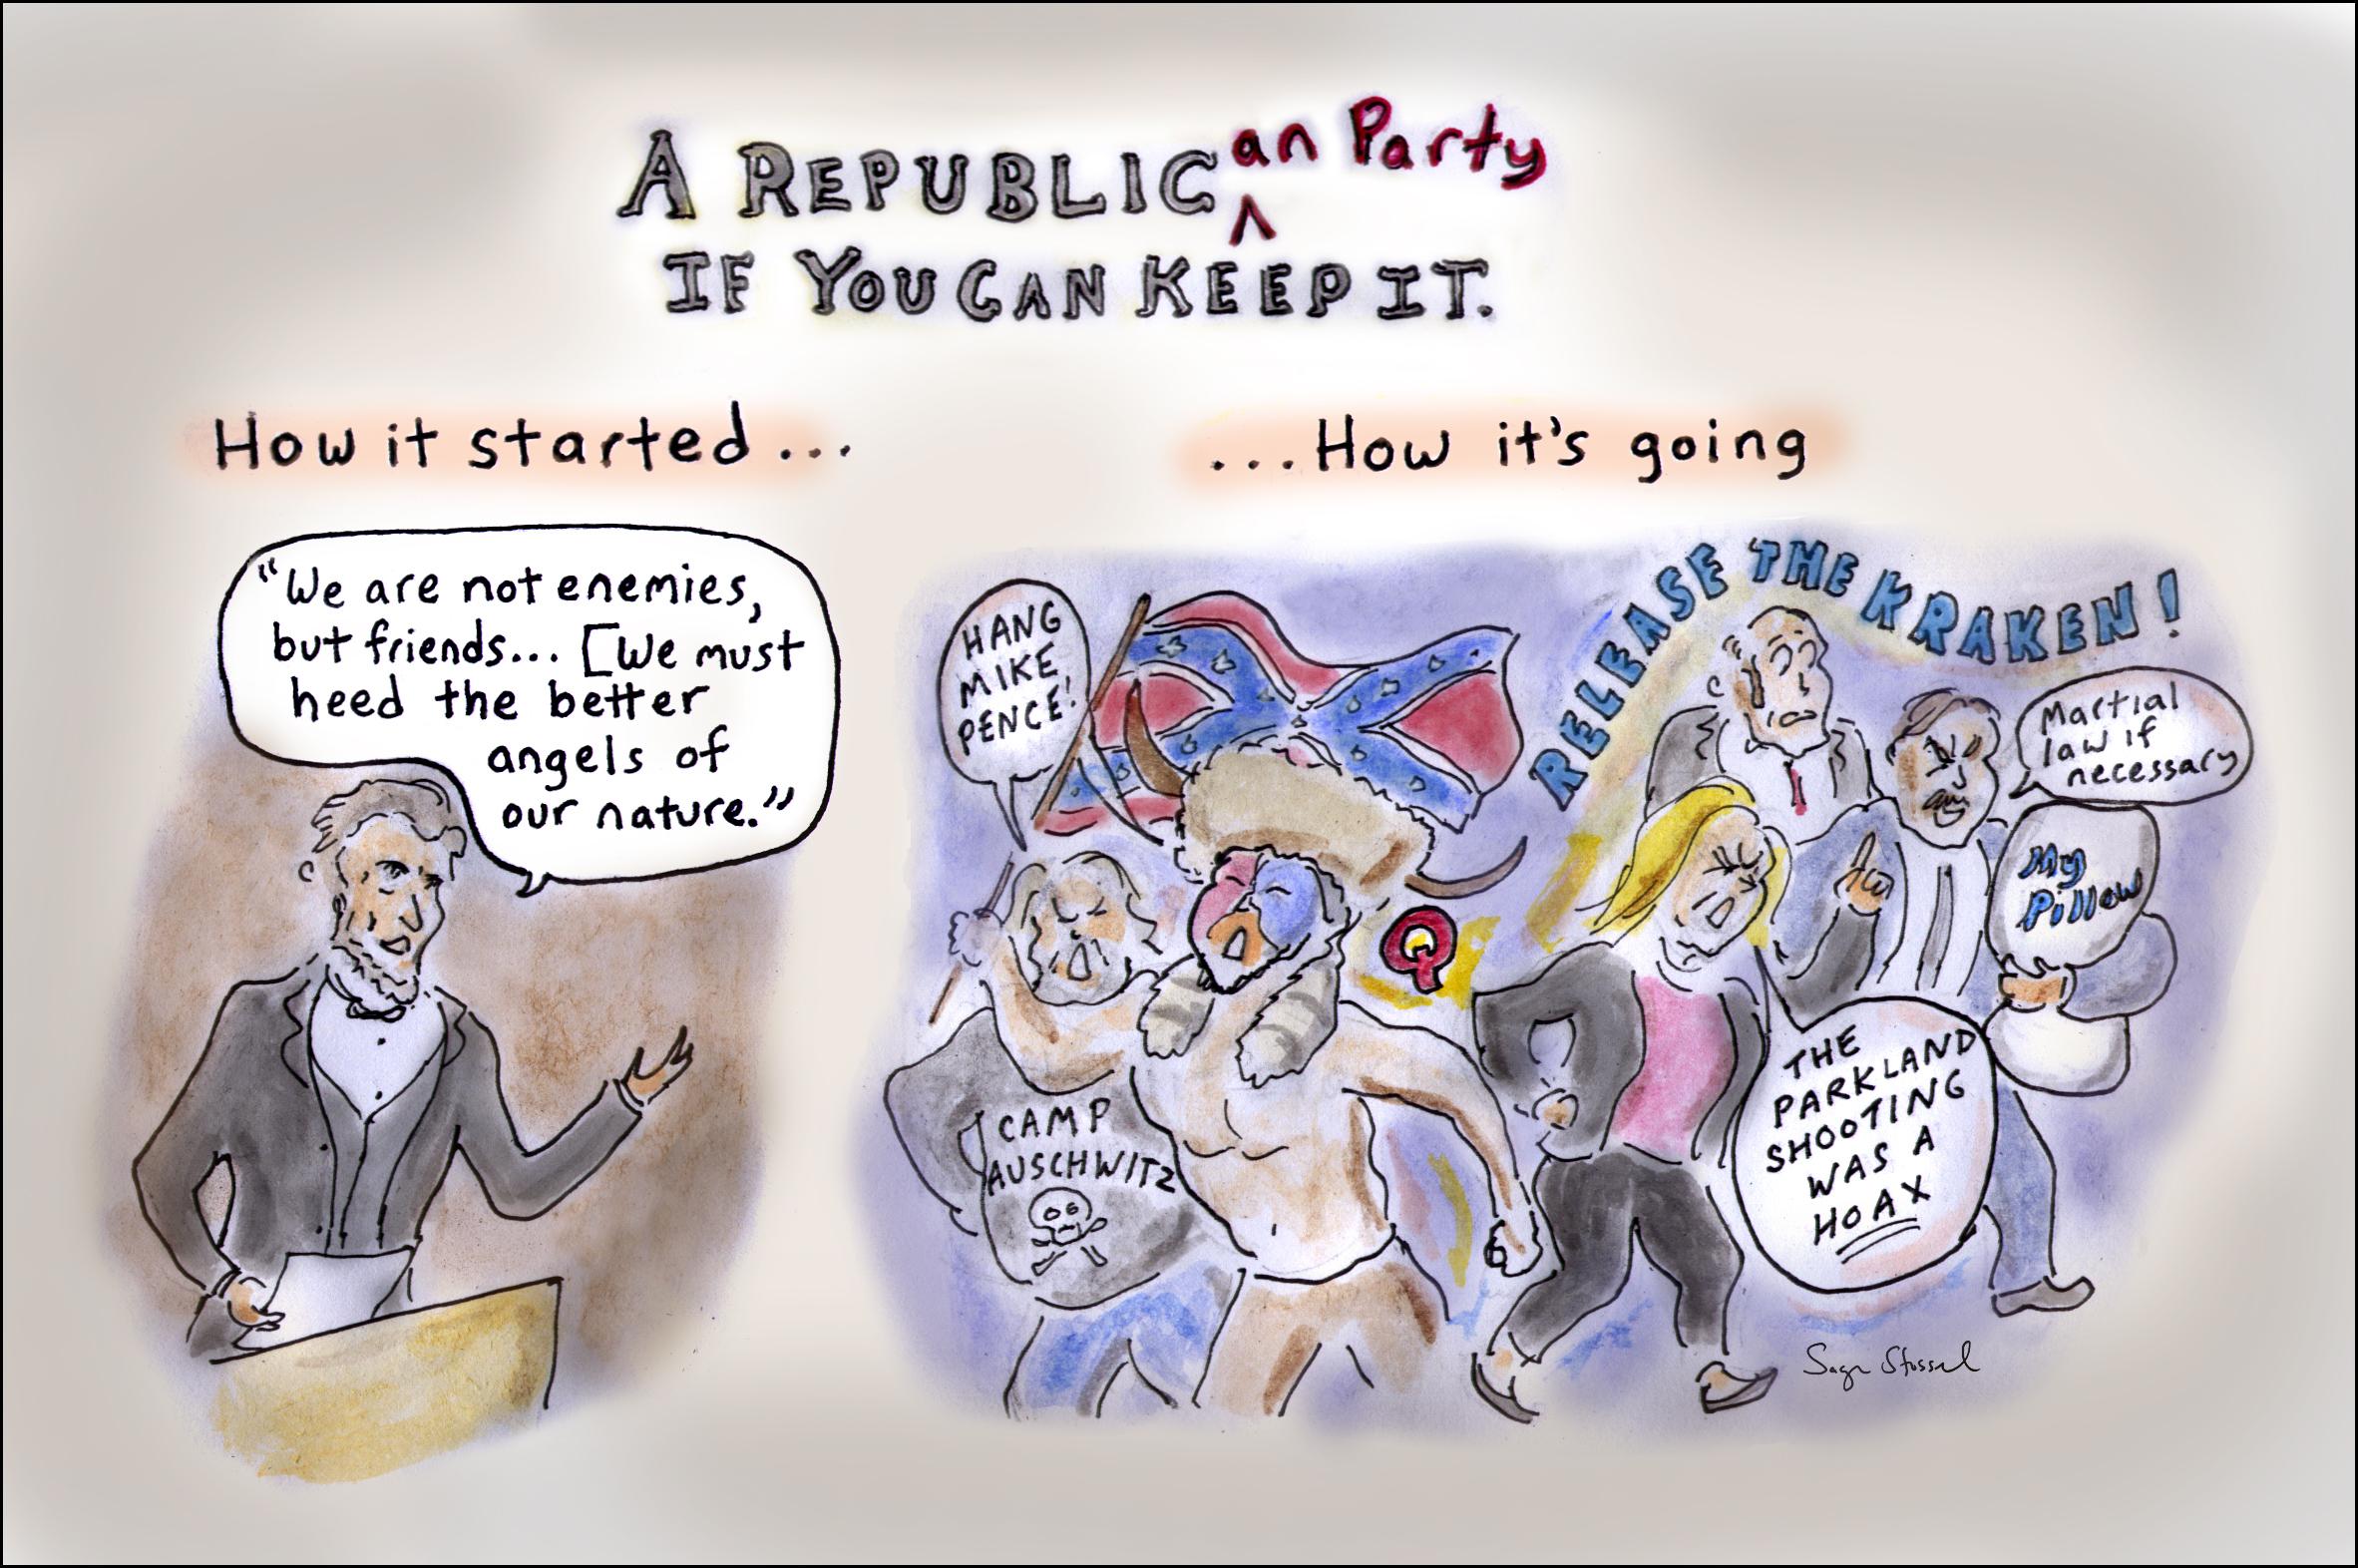 gop, republicans, marjorie taylor greene, Mike Lidell, abraham lincoln, rudy giuliani, release the kraken, qanon, democracy, party politics, trump, cartoon, sage stossel